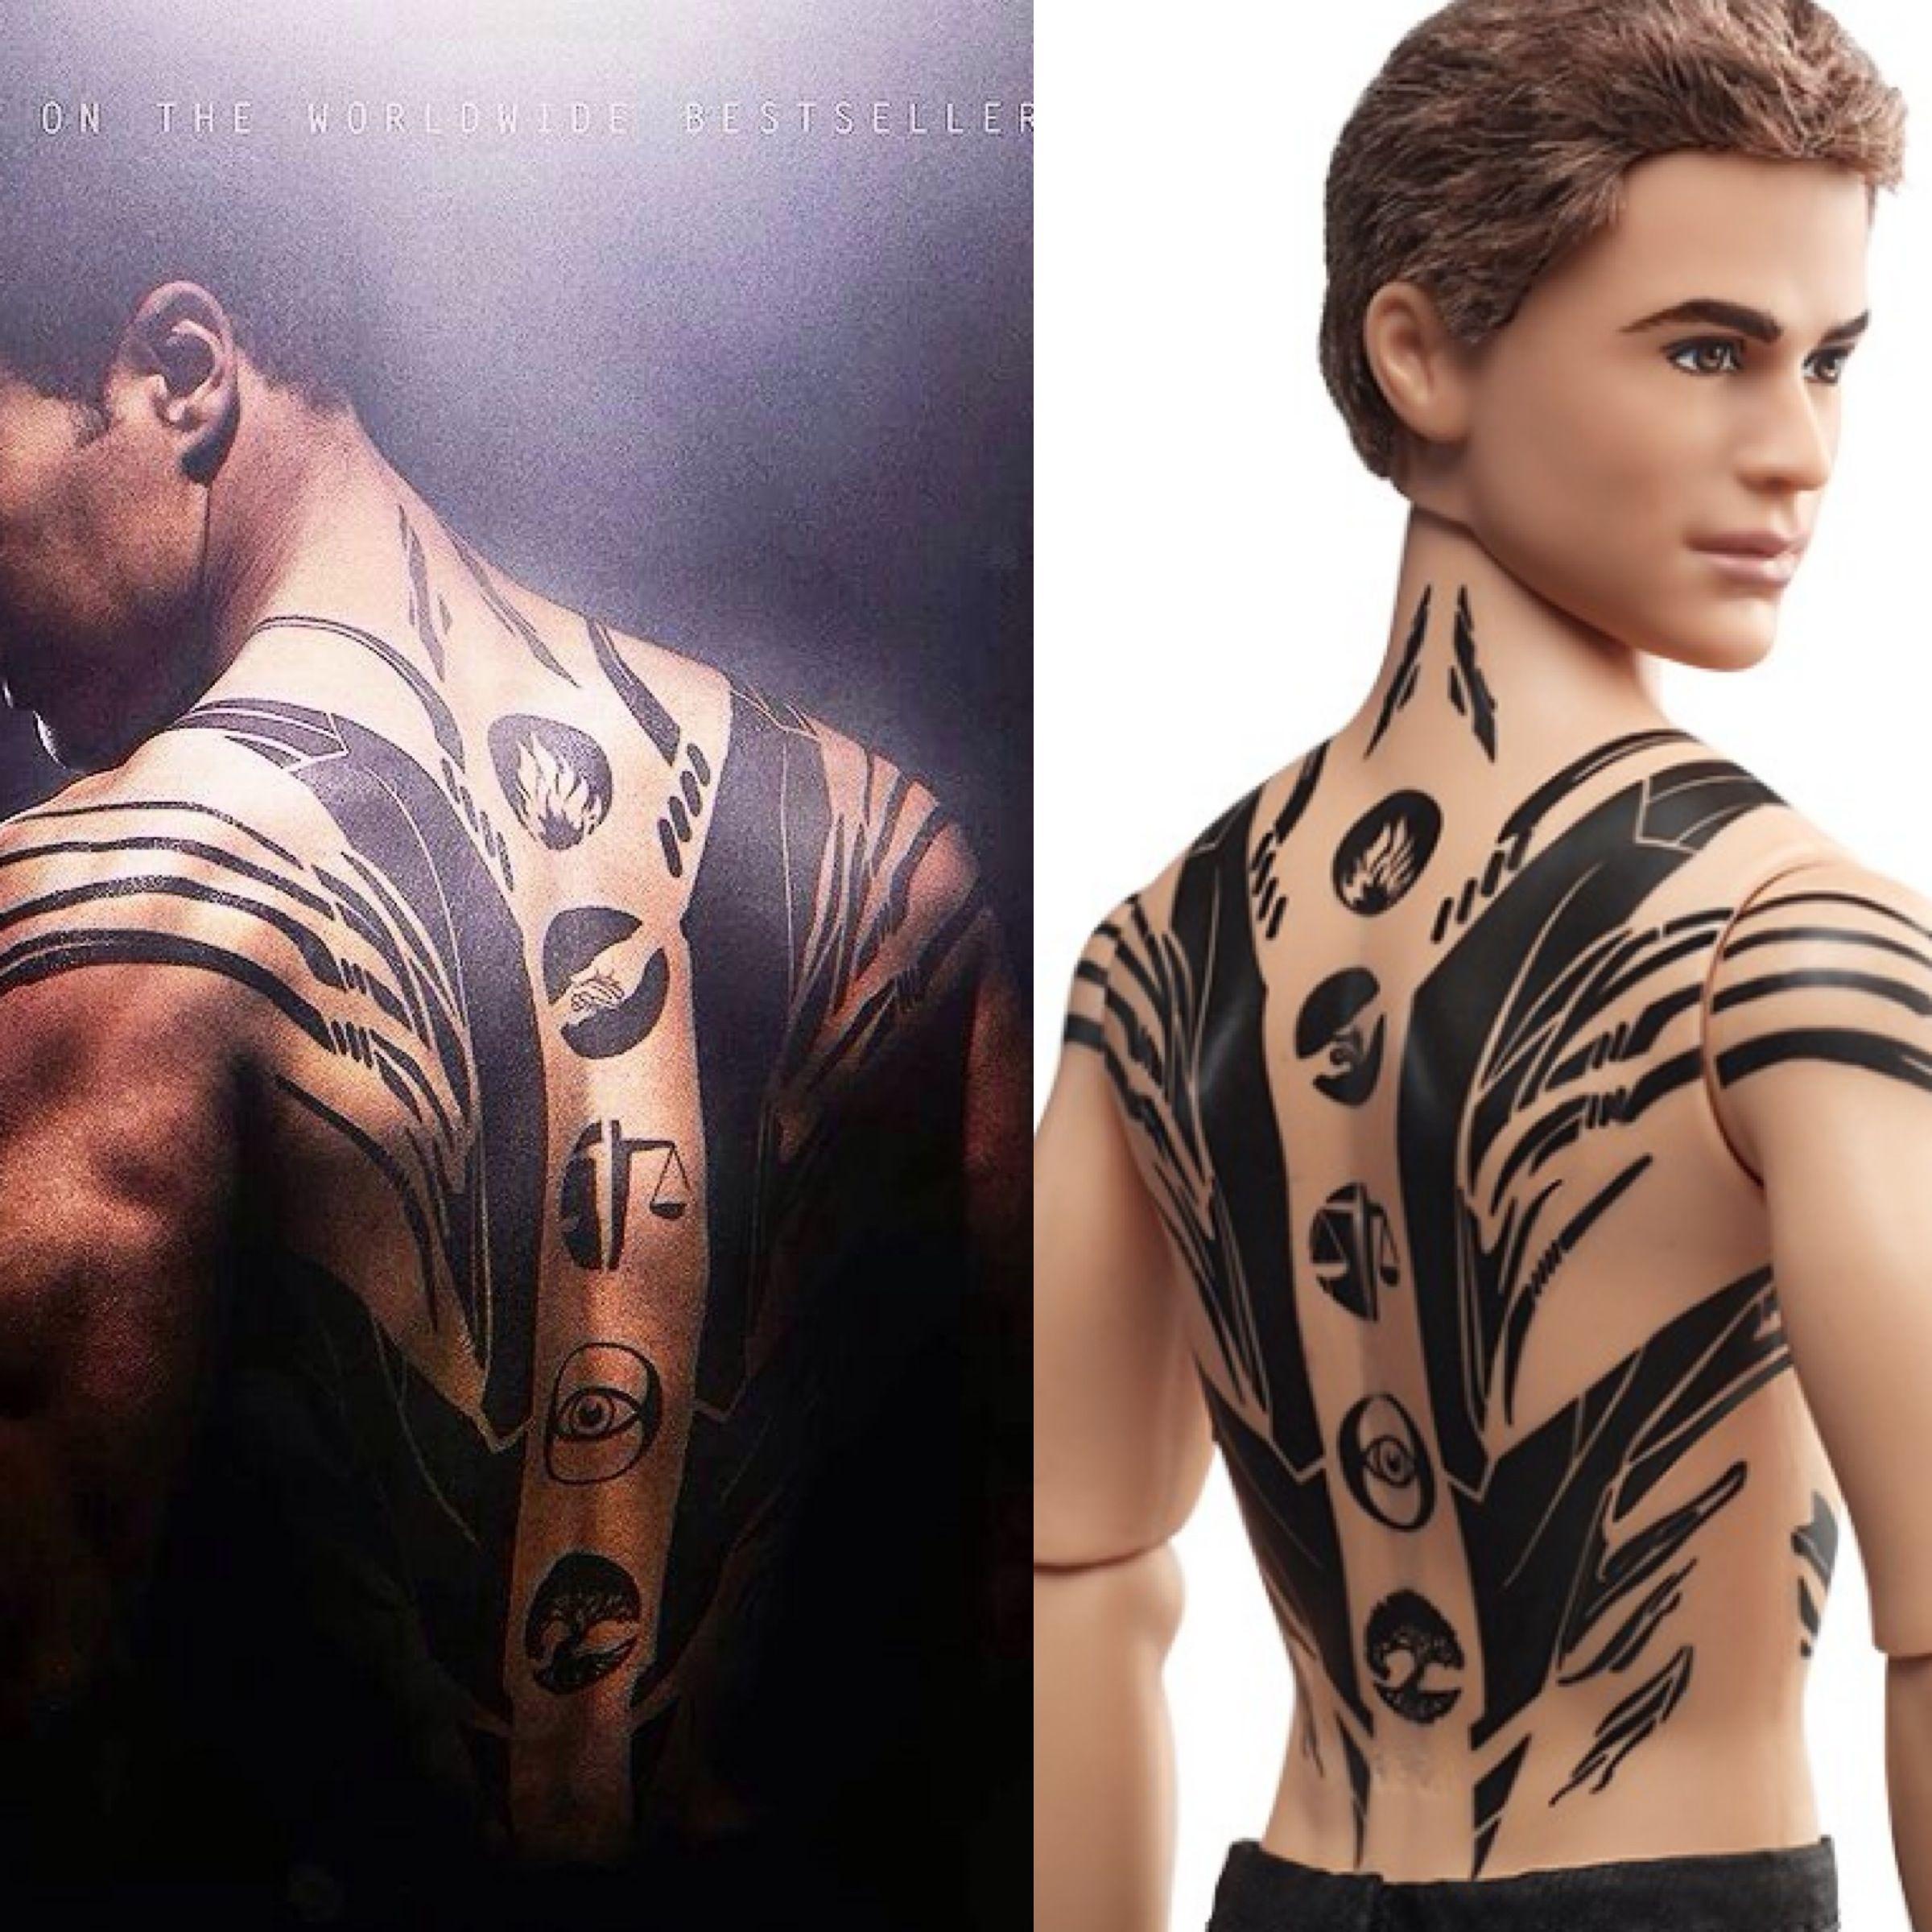 divergent four tattoo - Google Search | Fashion